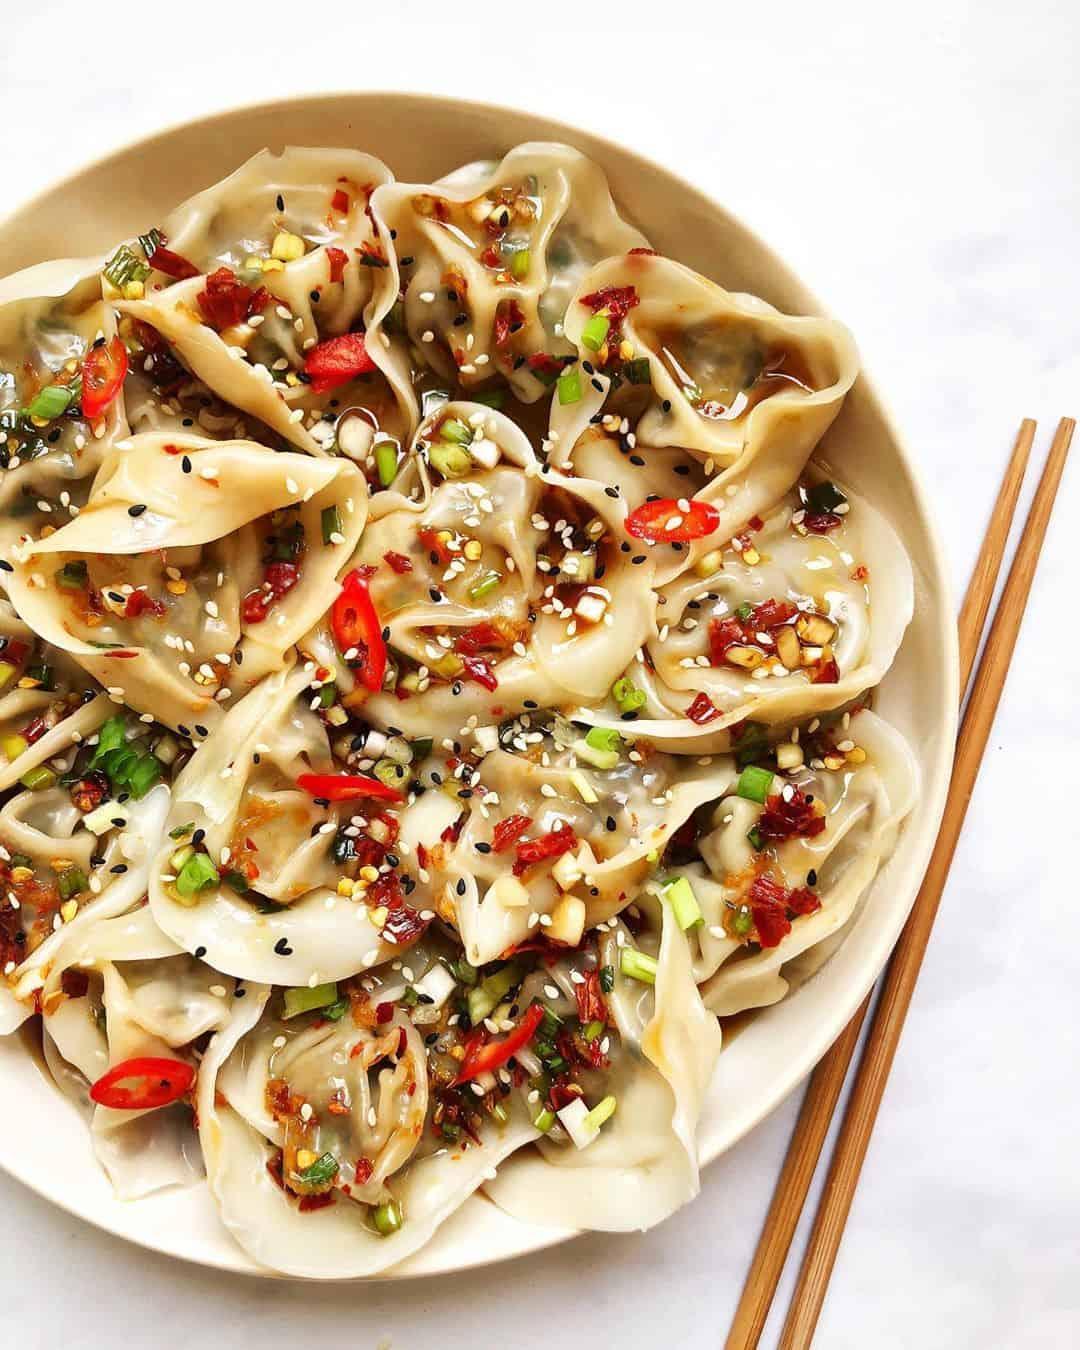 Chestnut Mushroom Dumplings with Spicy Chili Oil Sauce